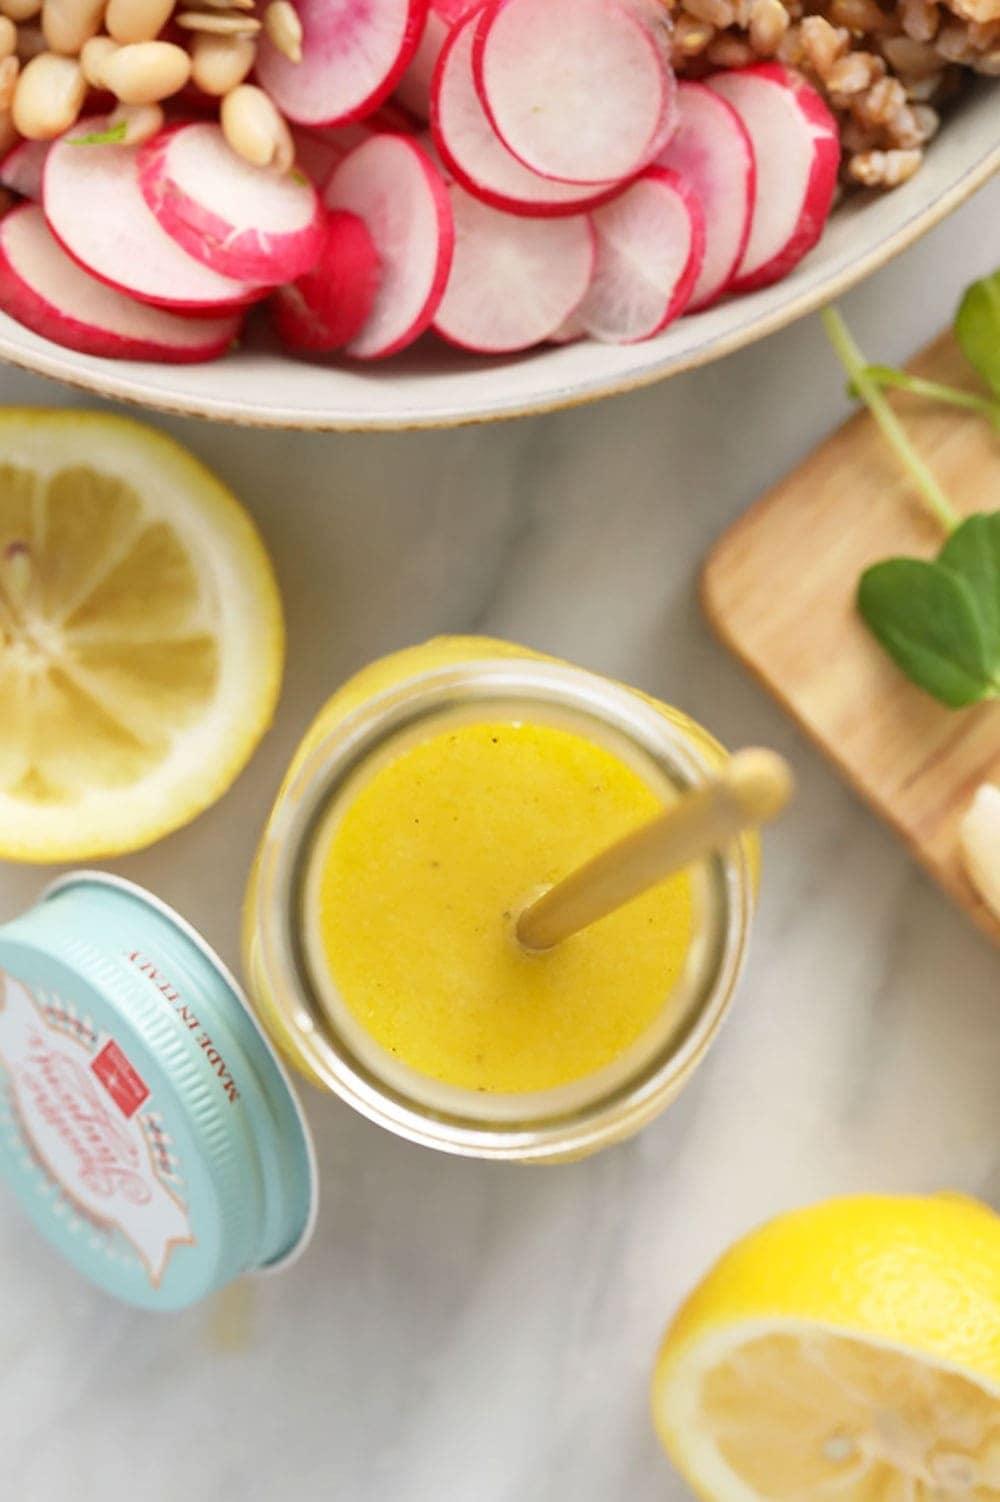 homemade lemon vinaigrette dressing in a jar ready to dress a salad